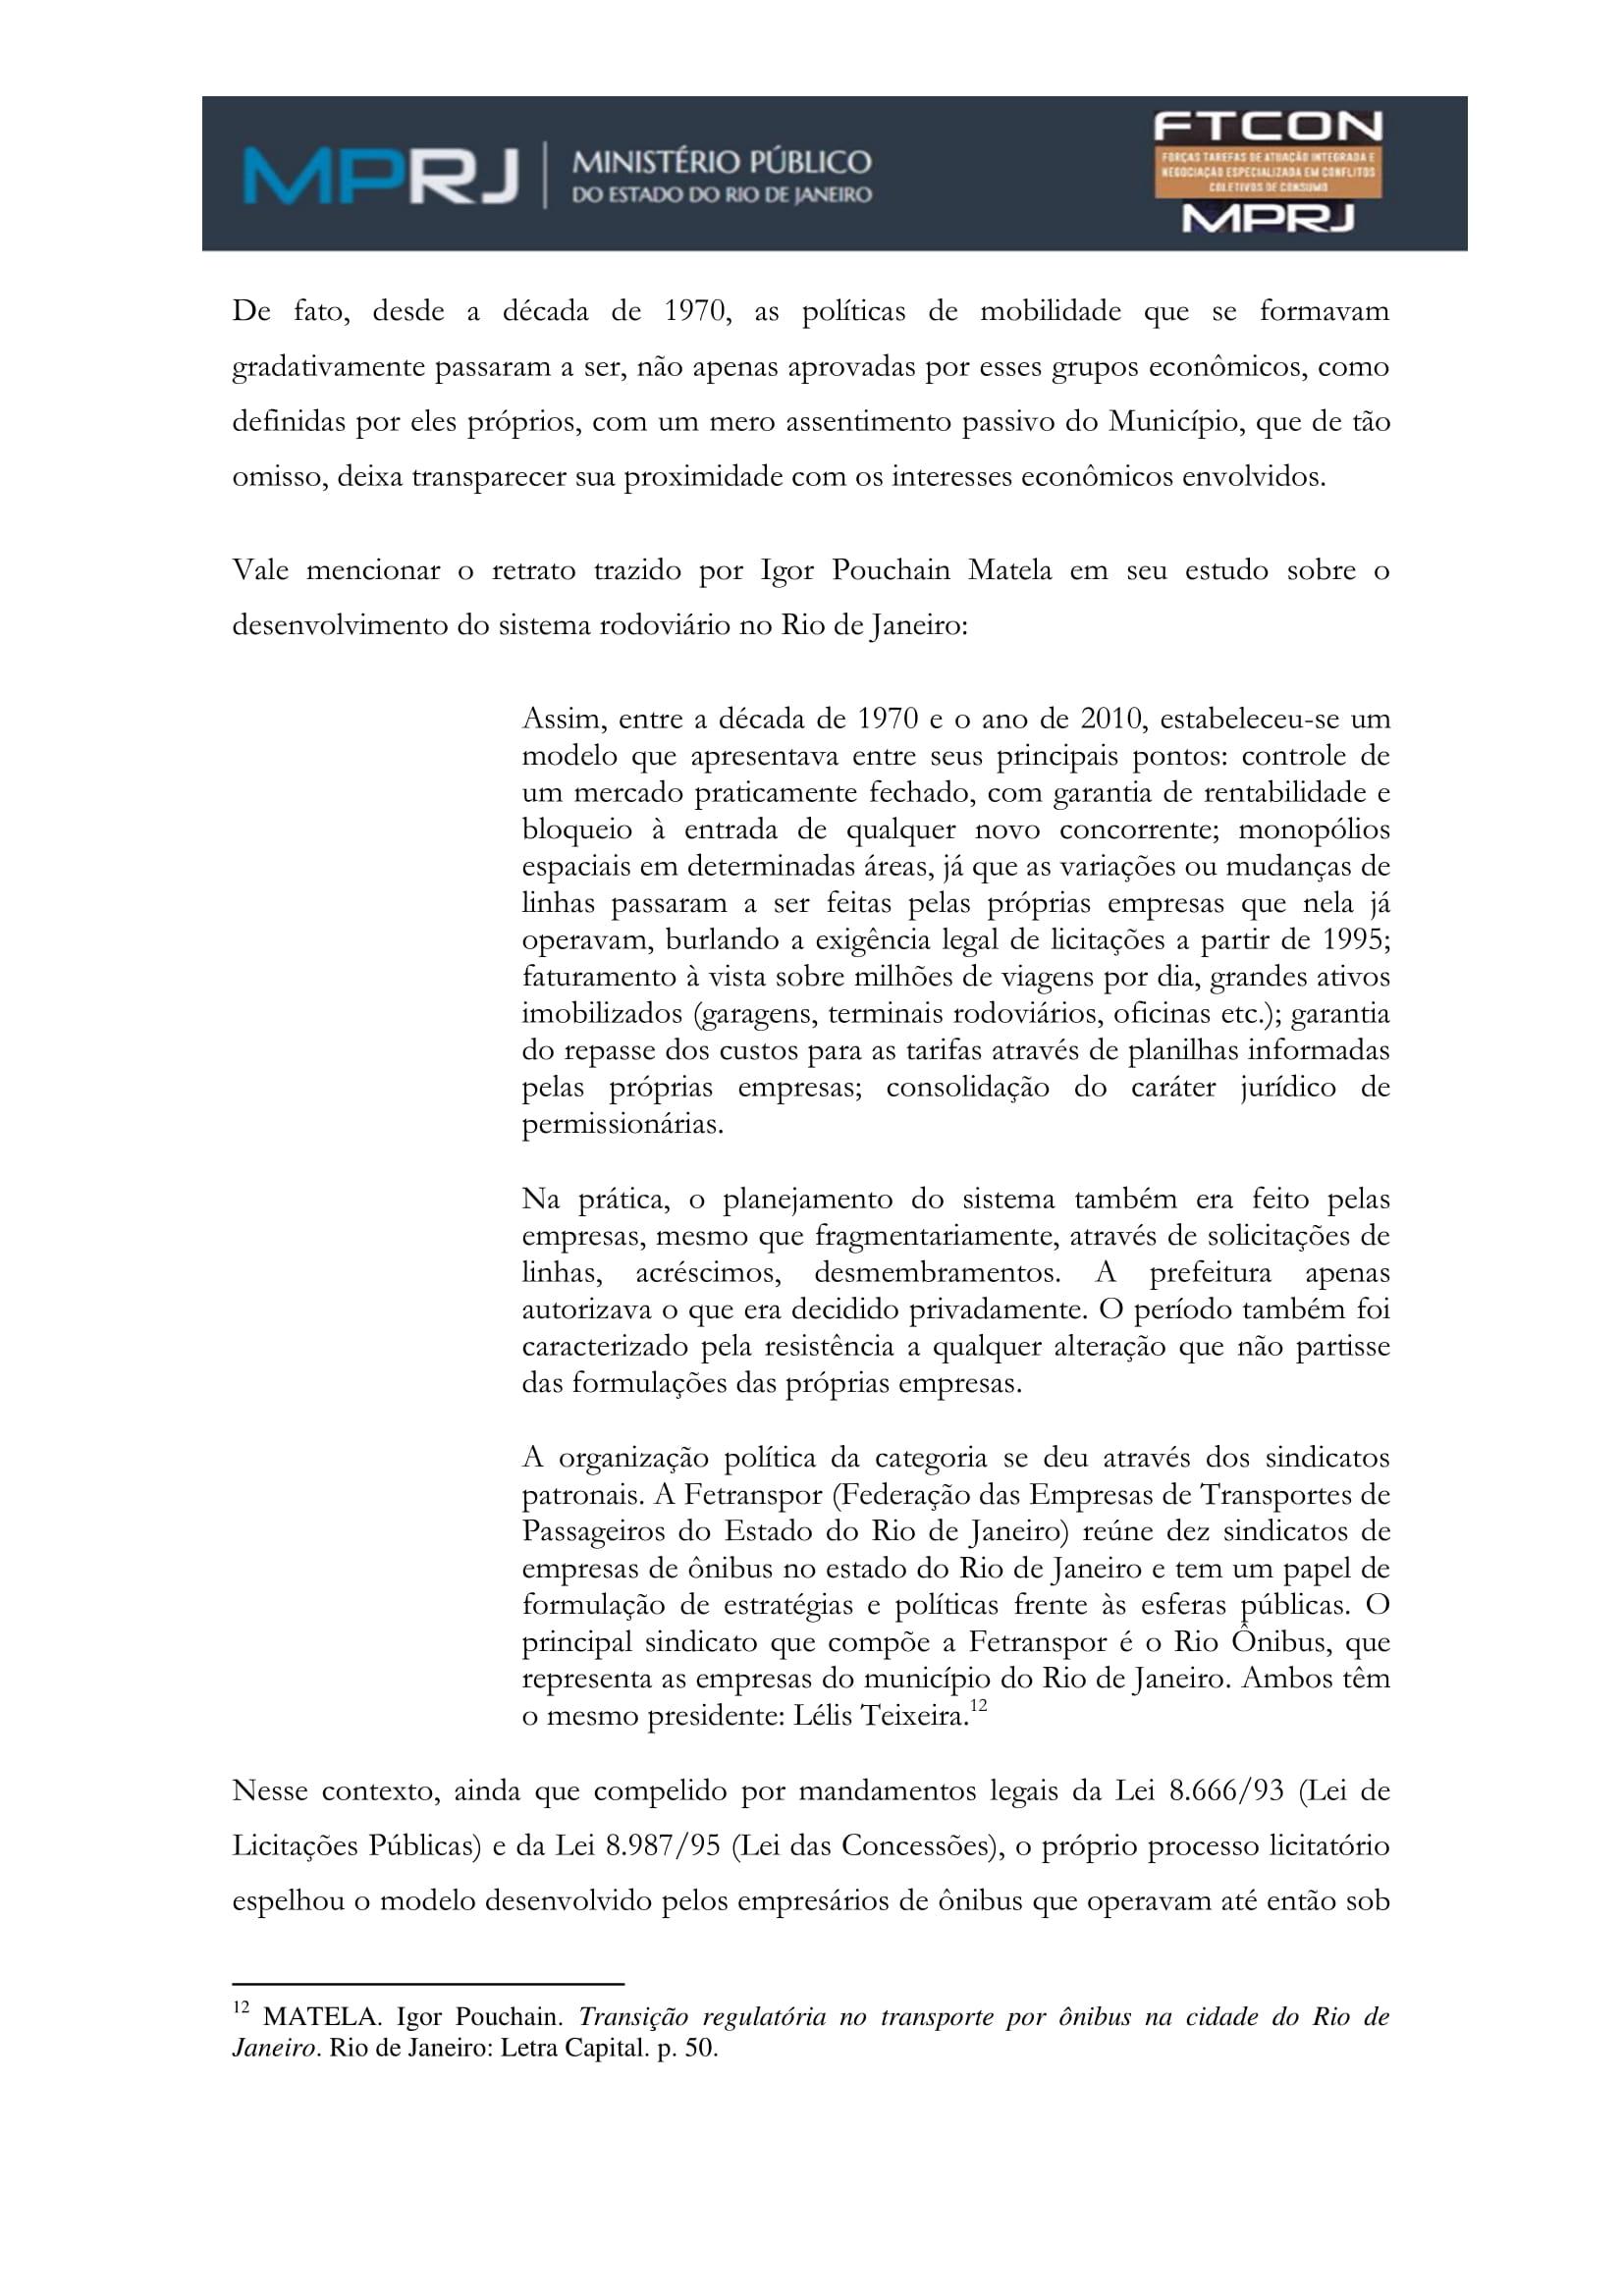 acp_caducidade_onibus_dr_rt-014